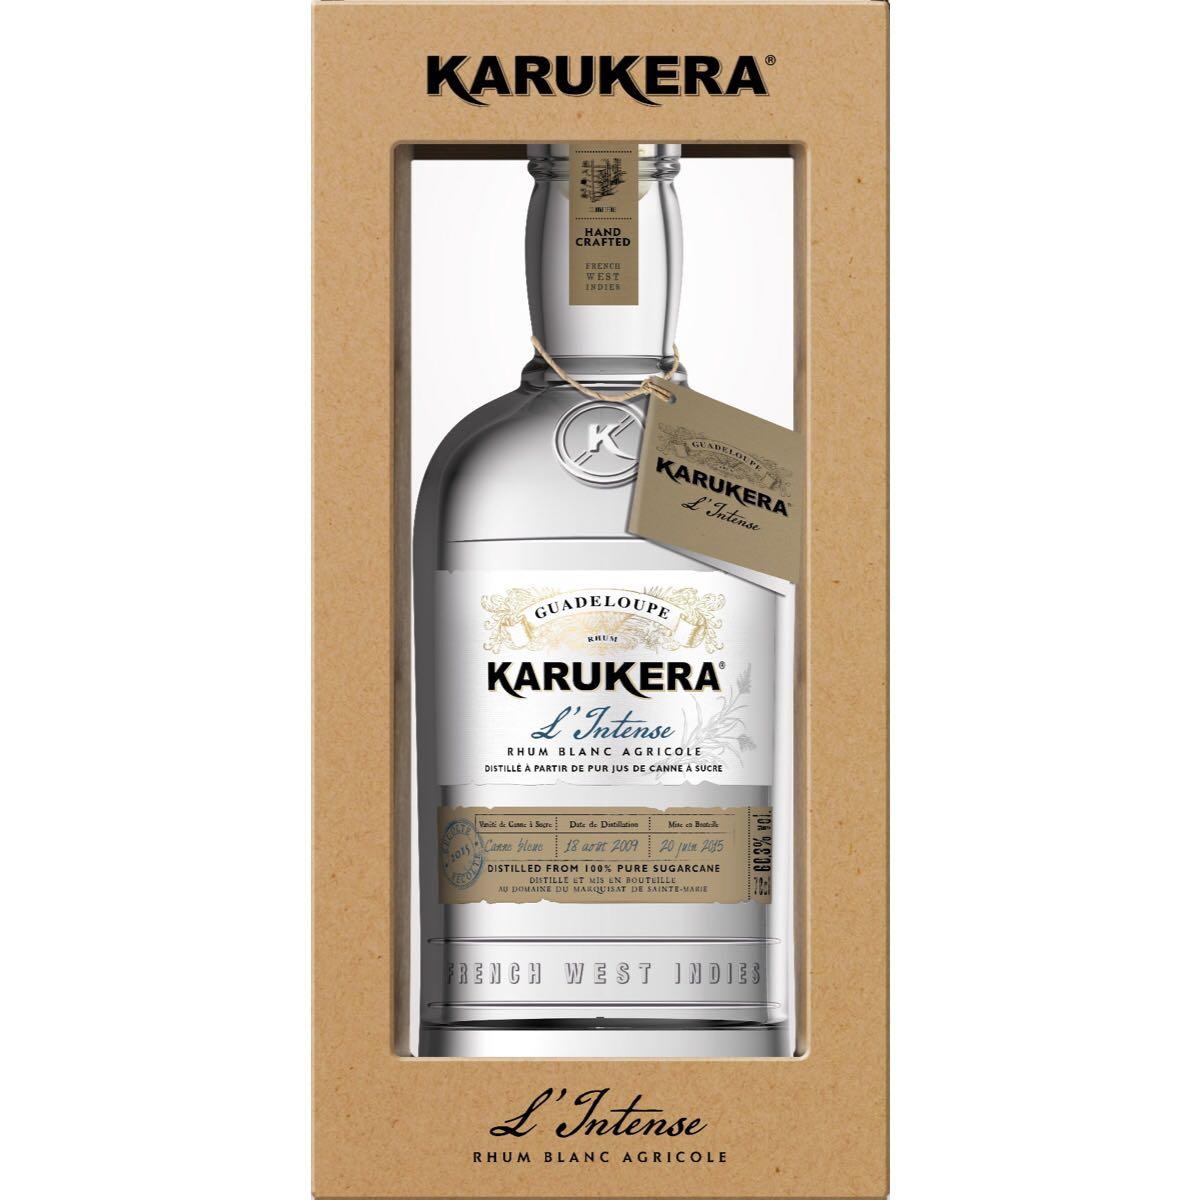 Bottle image of Karukera L'Intense